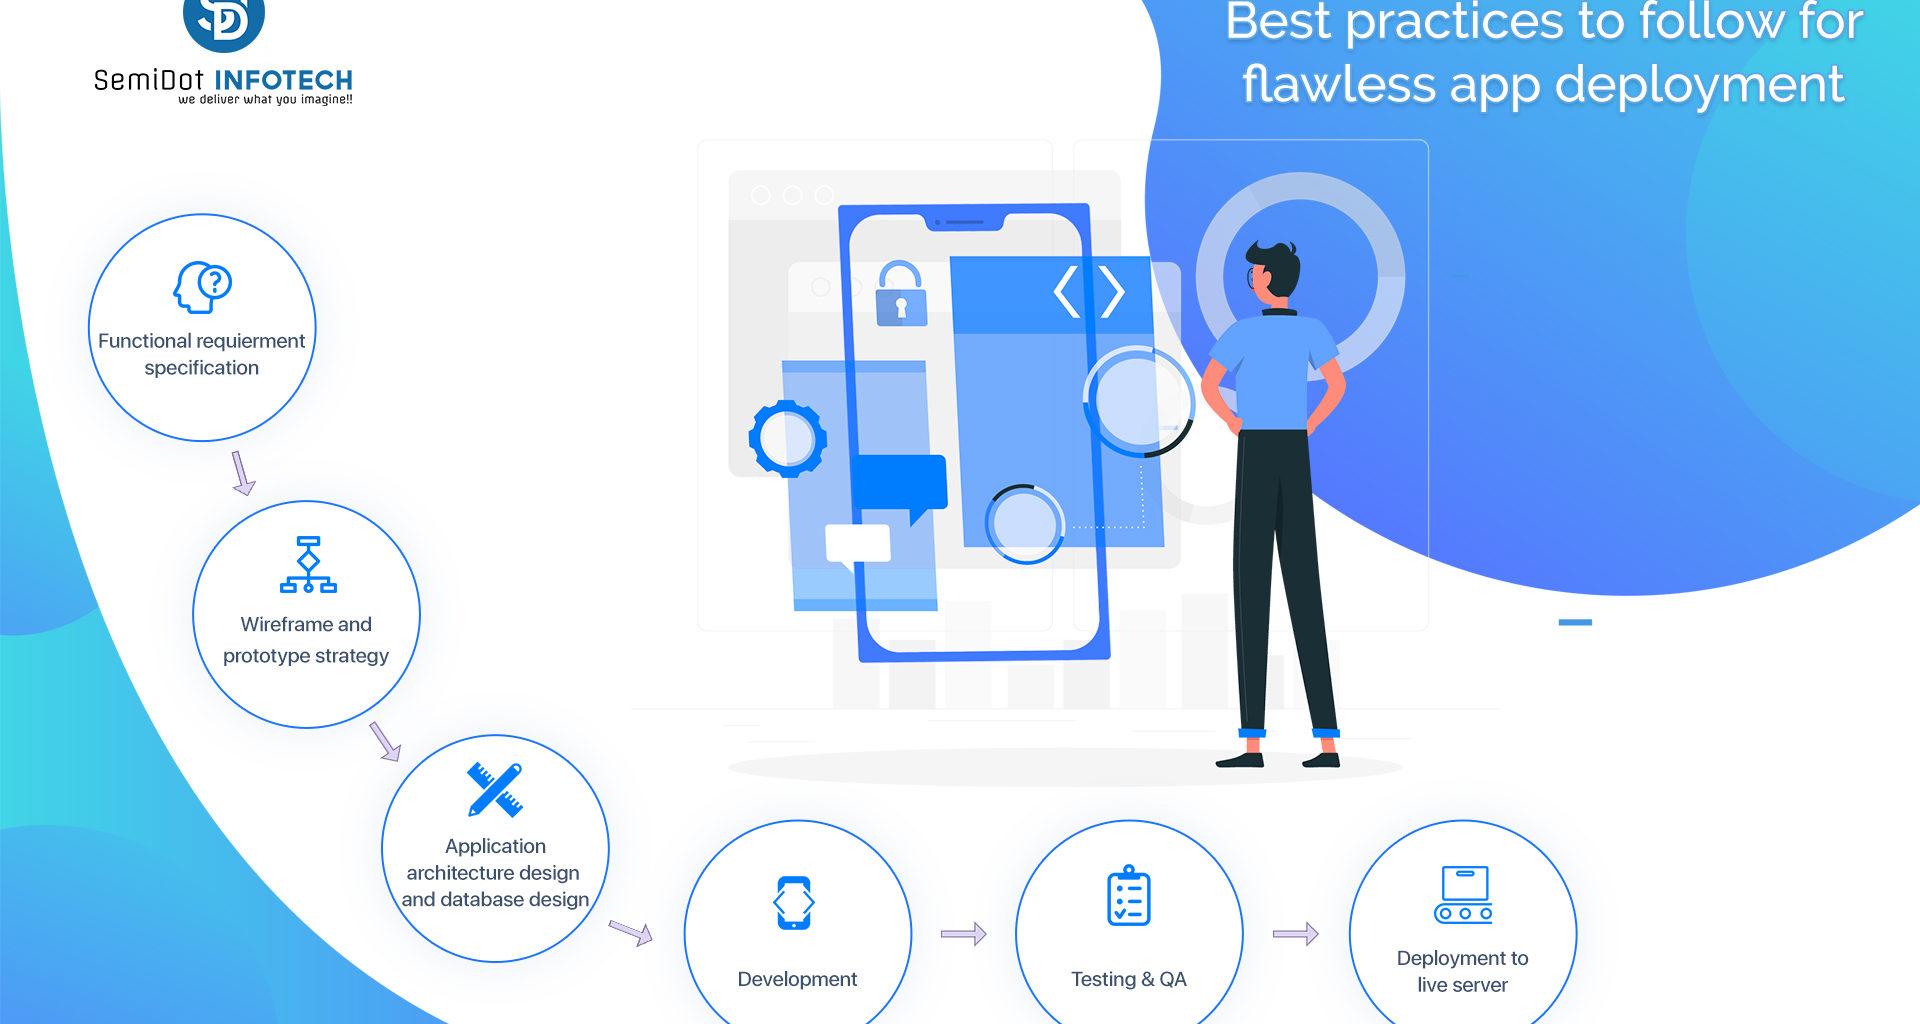 Best Practices to Follow for Flawless App Deployment - Semidot Infotech